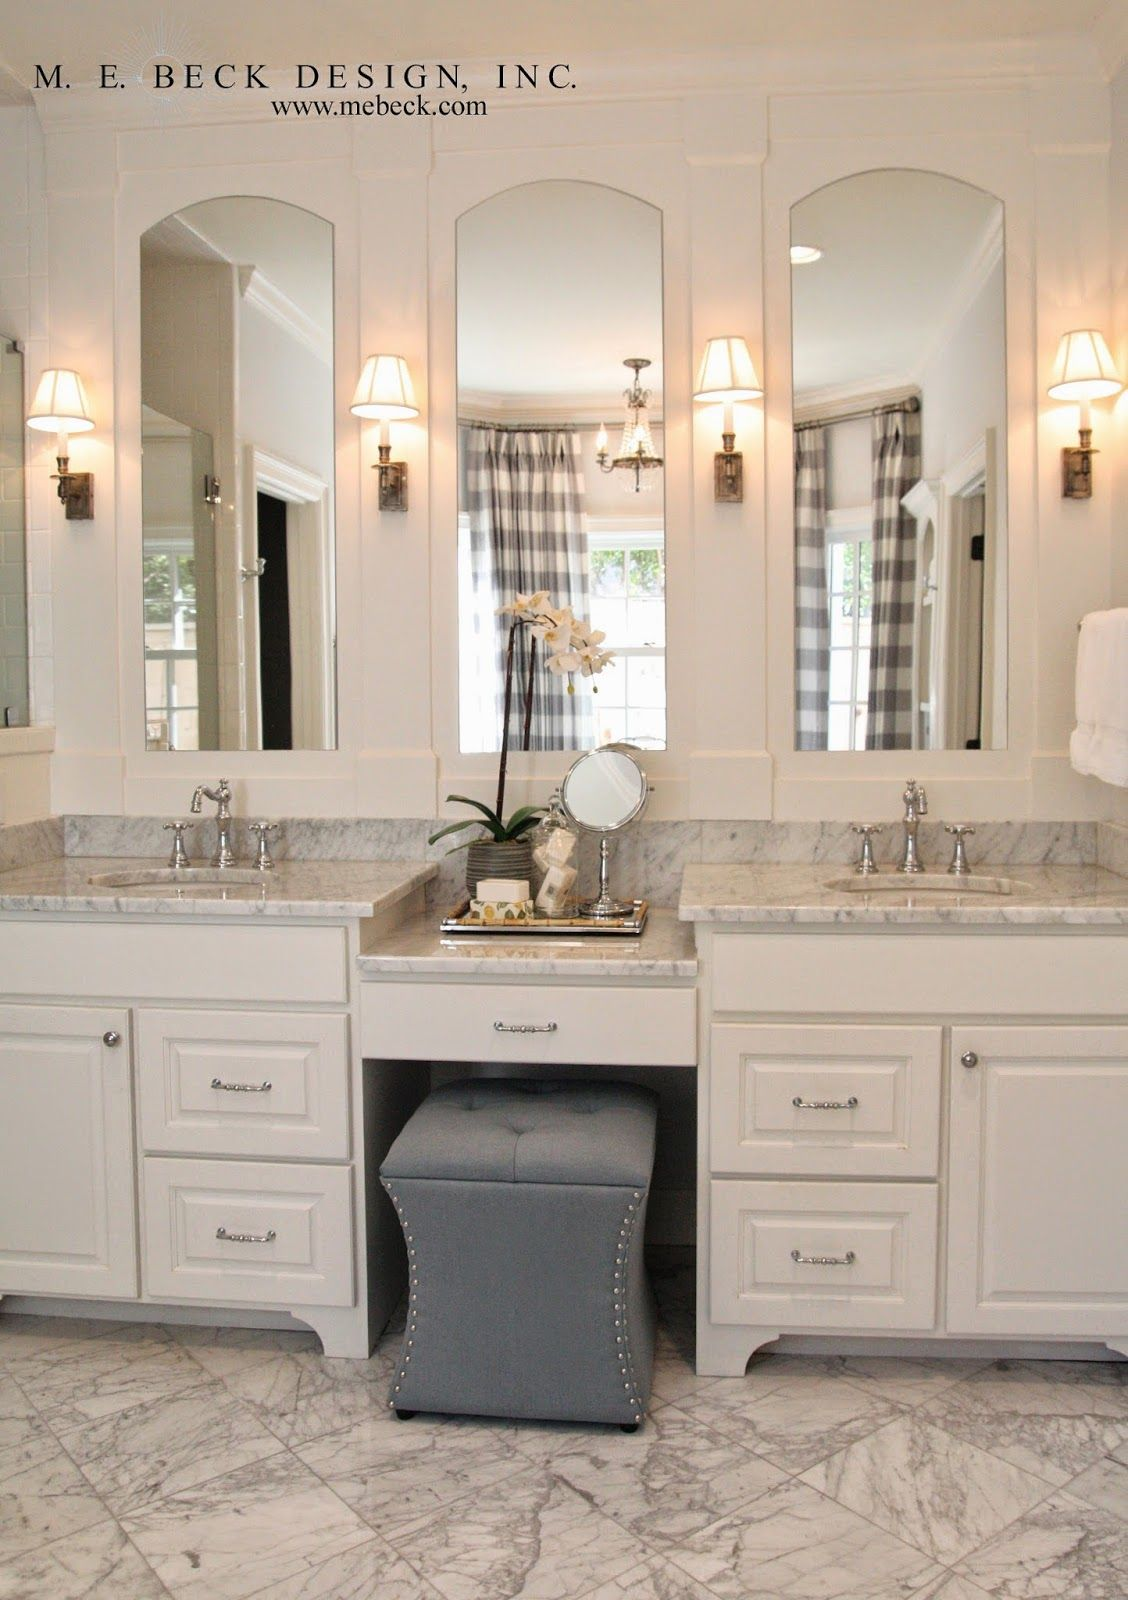 bathroom mirror ideas diy for a small bathroom on home inspirations this year the perfect dream bathrooms diy bathroom ideas id=24613